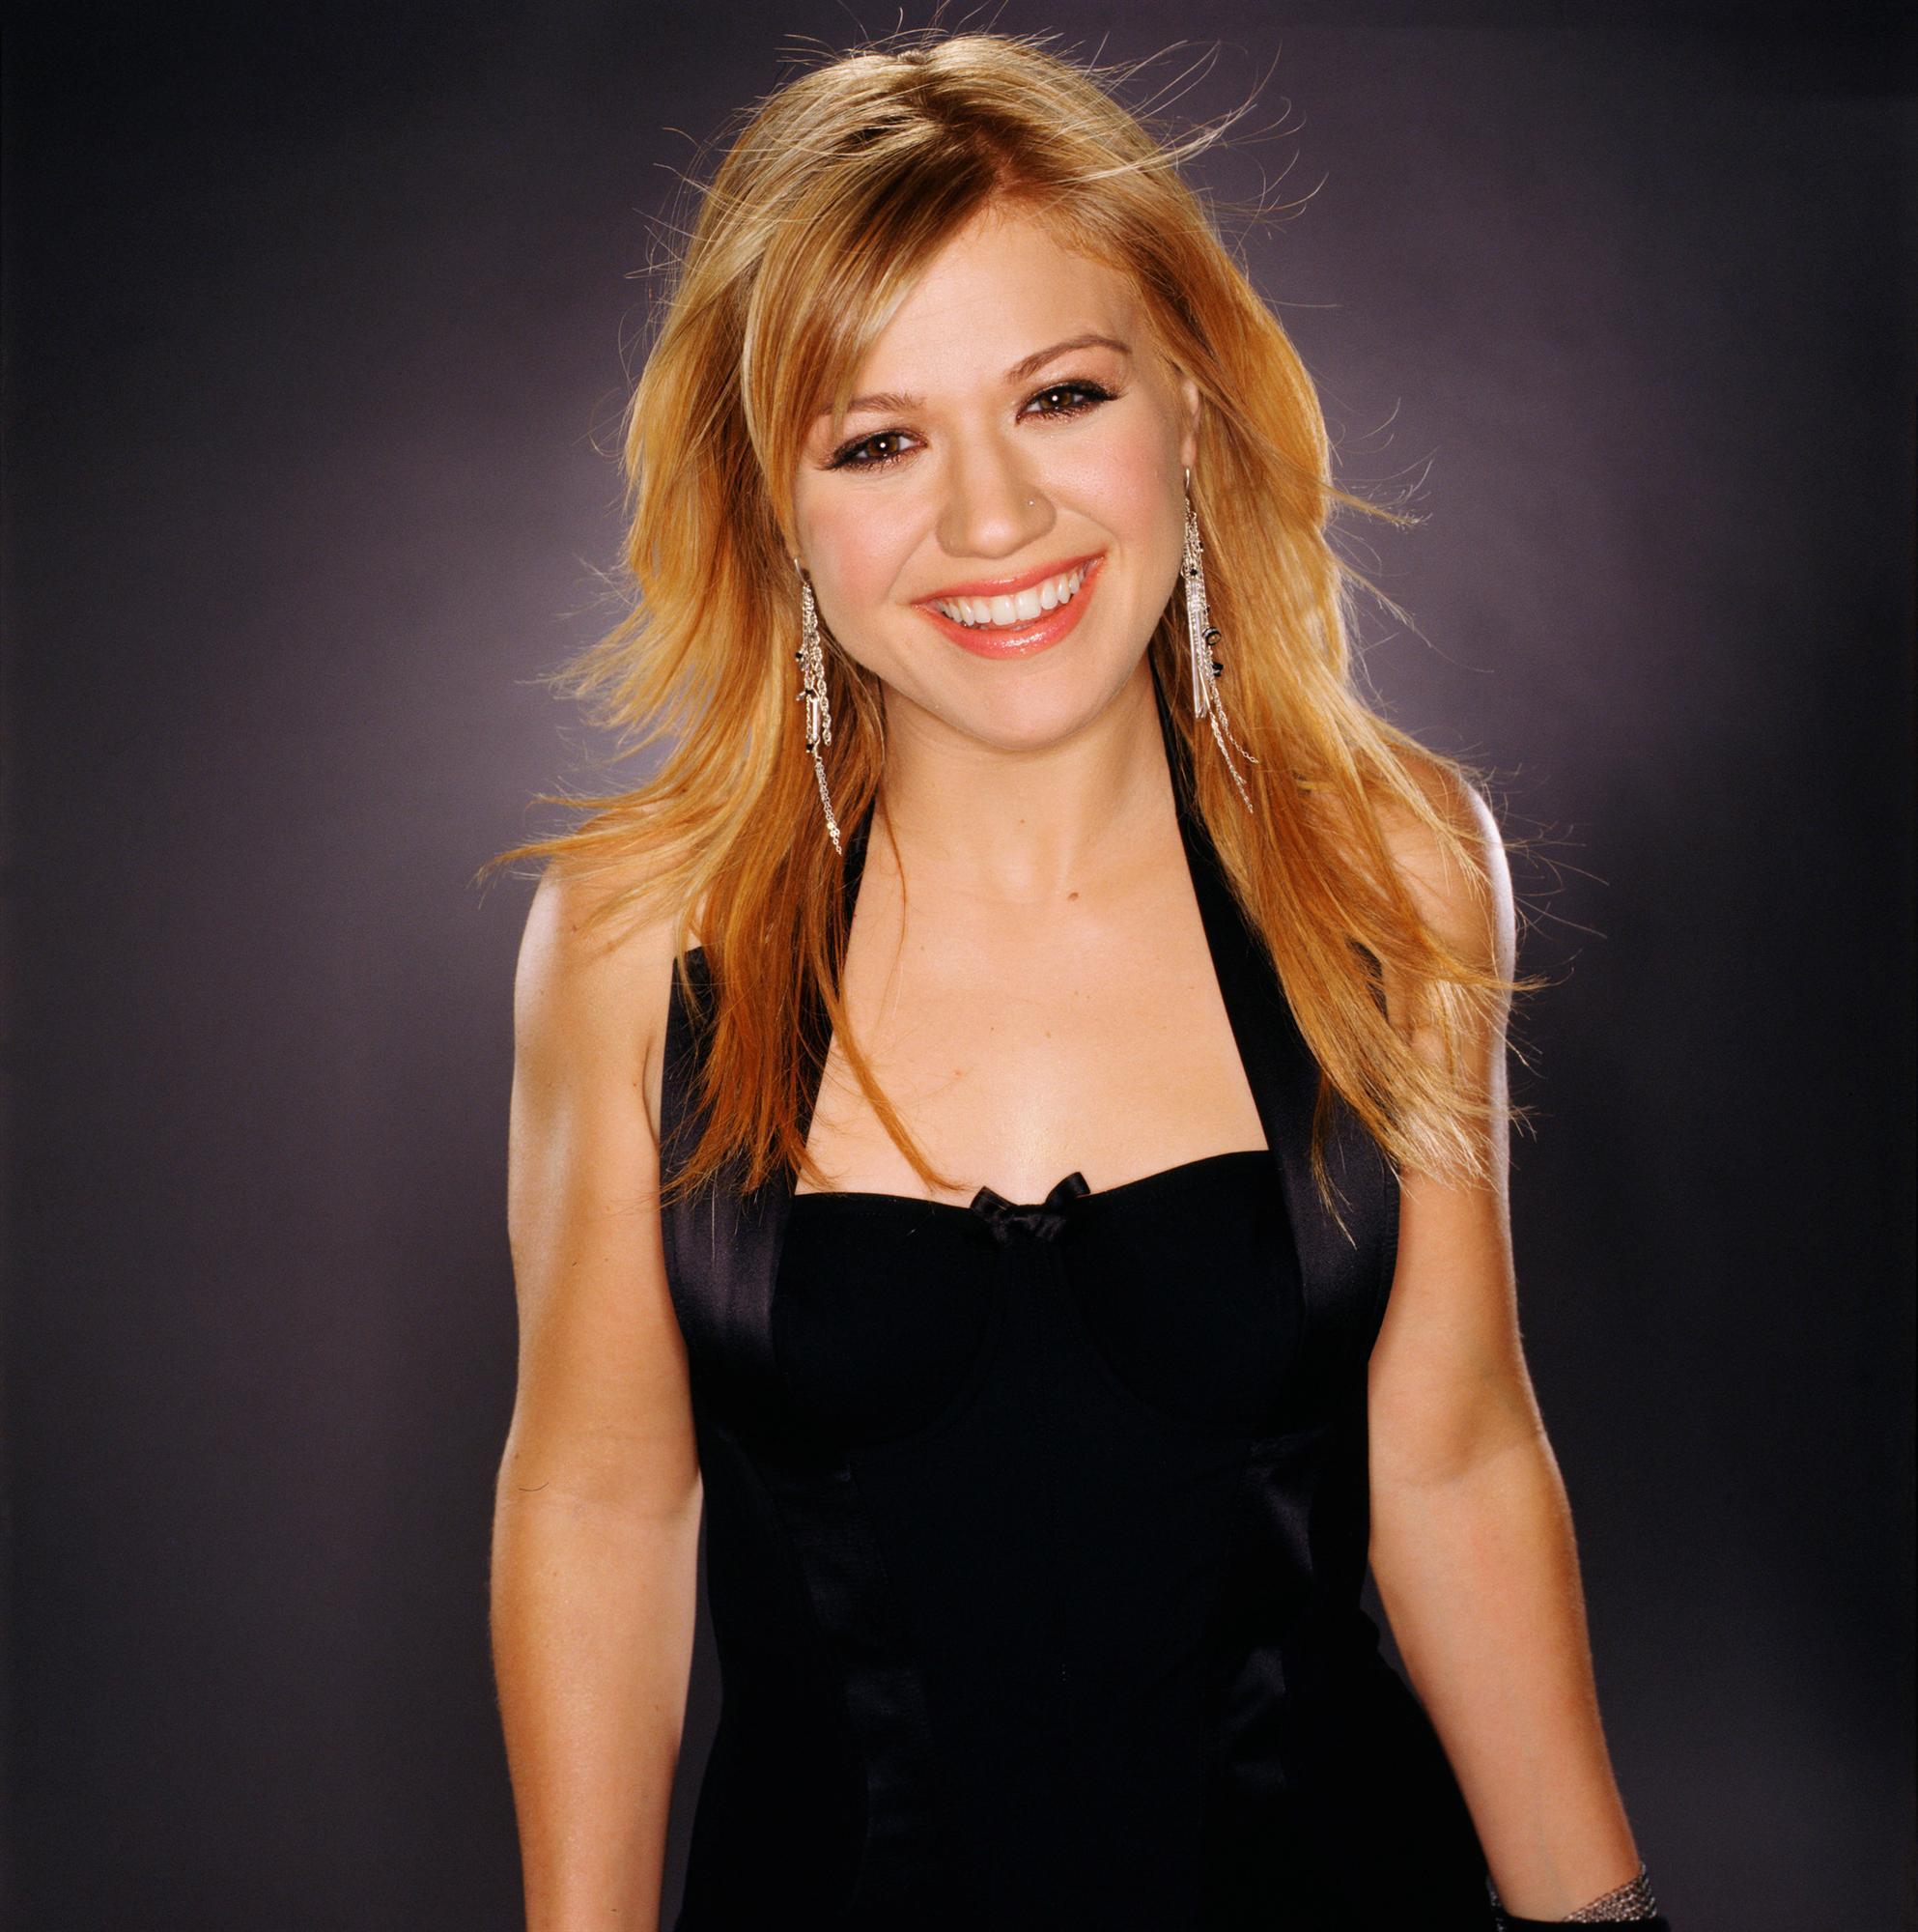 Kelly Clarkson HD pics